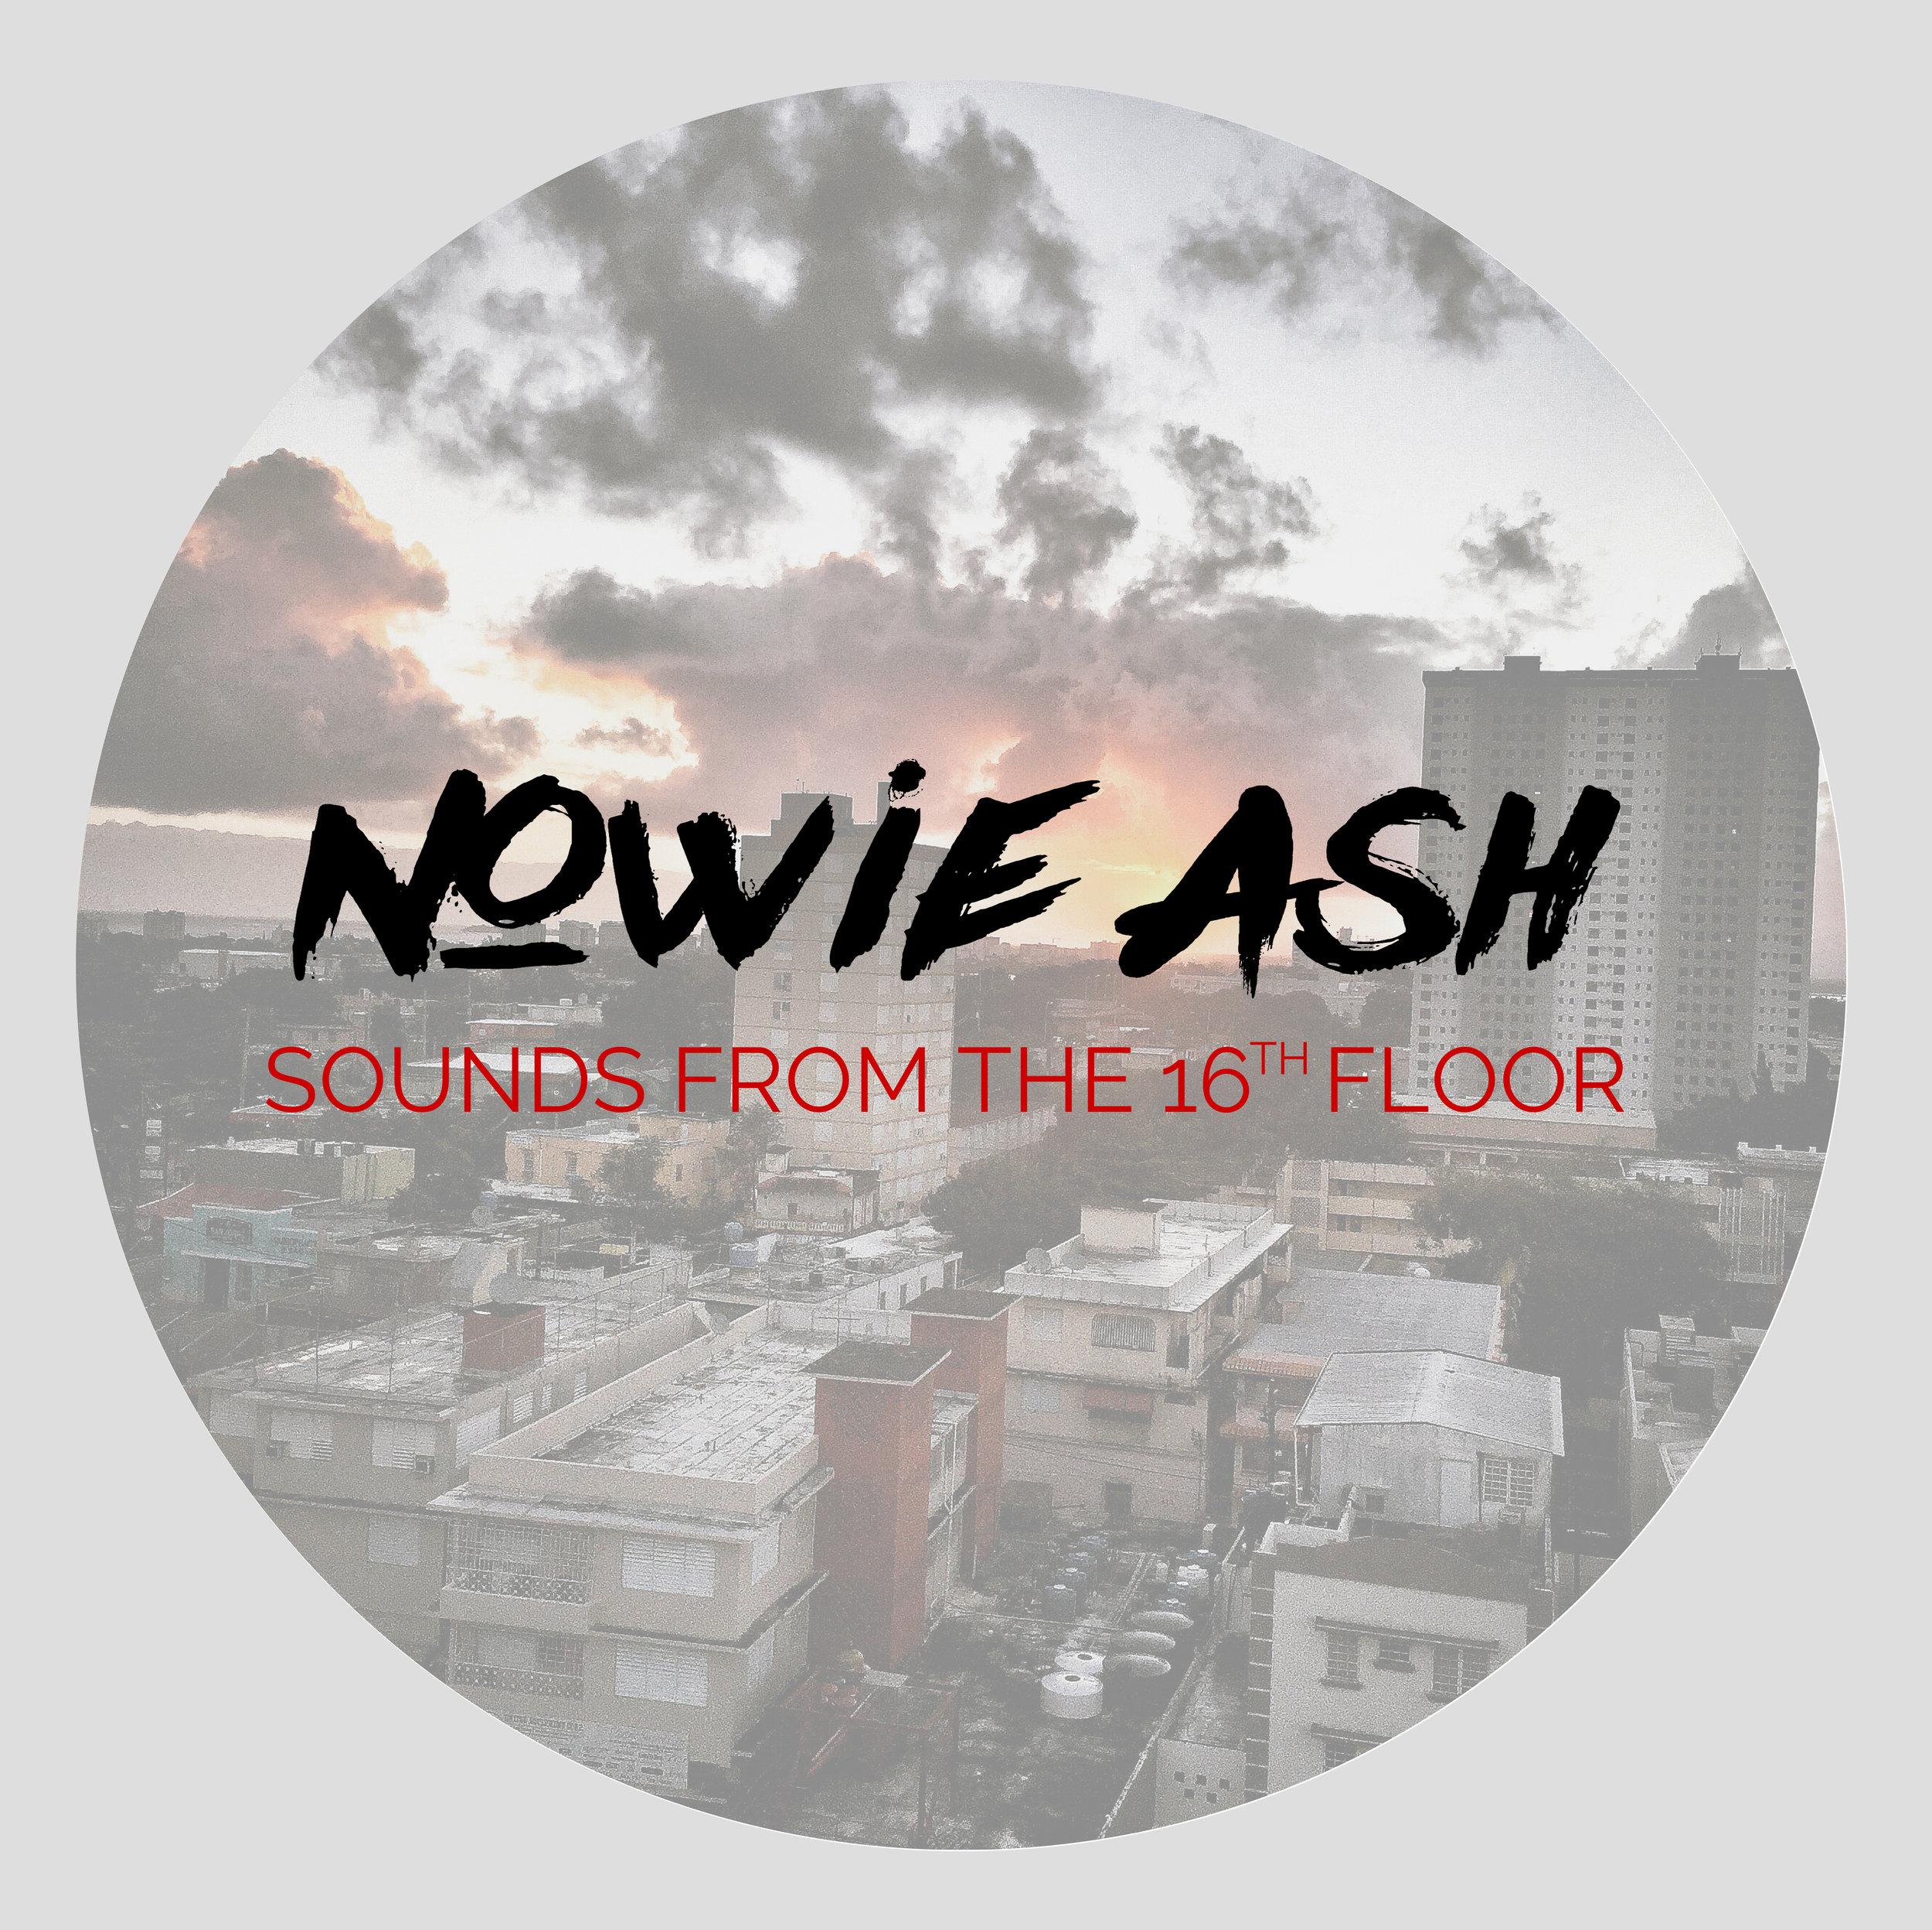 © 2016 Brutal Noise / 1602 Studios -- Released on June 3rd, 2016.